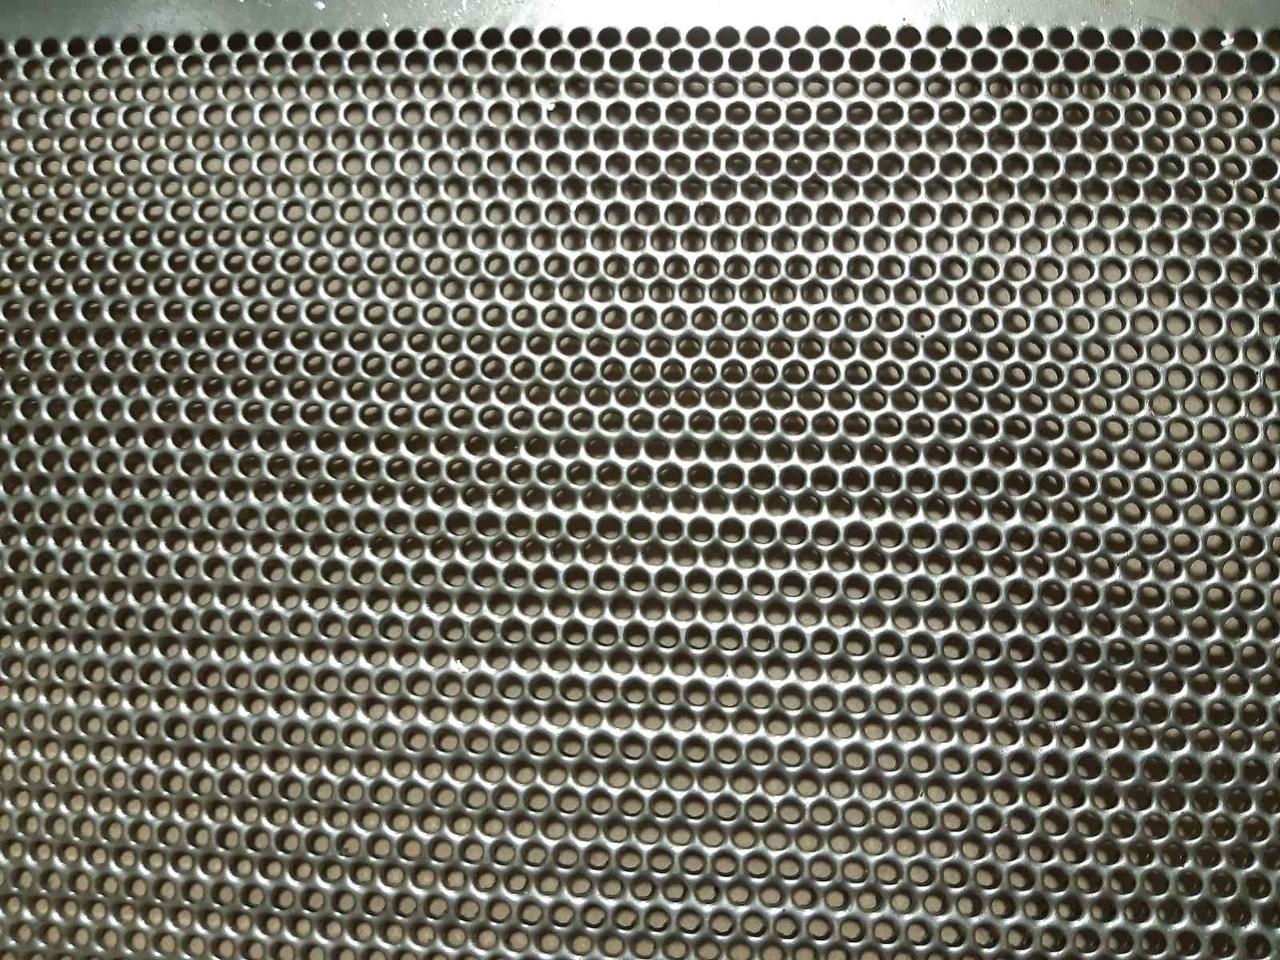 Друшляк (сито) 790х990 товщина 0,8* 2 \ 2,2 \ 2,5 \ 2,8 \ 3 мм діамет кр